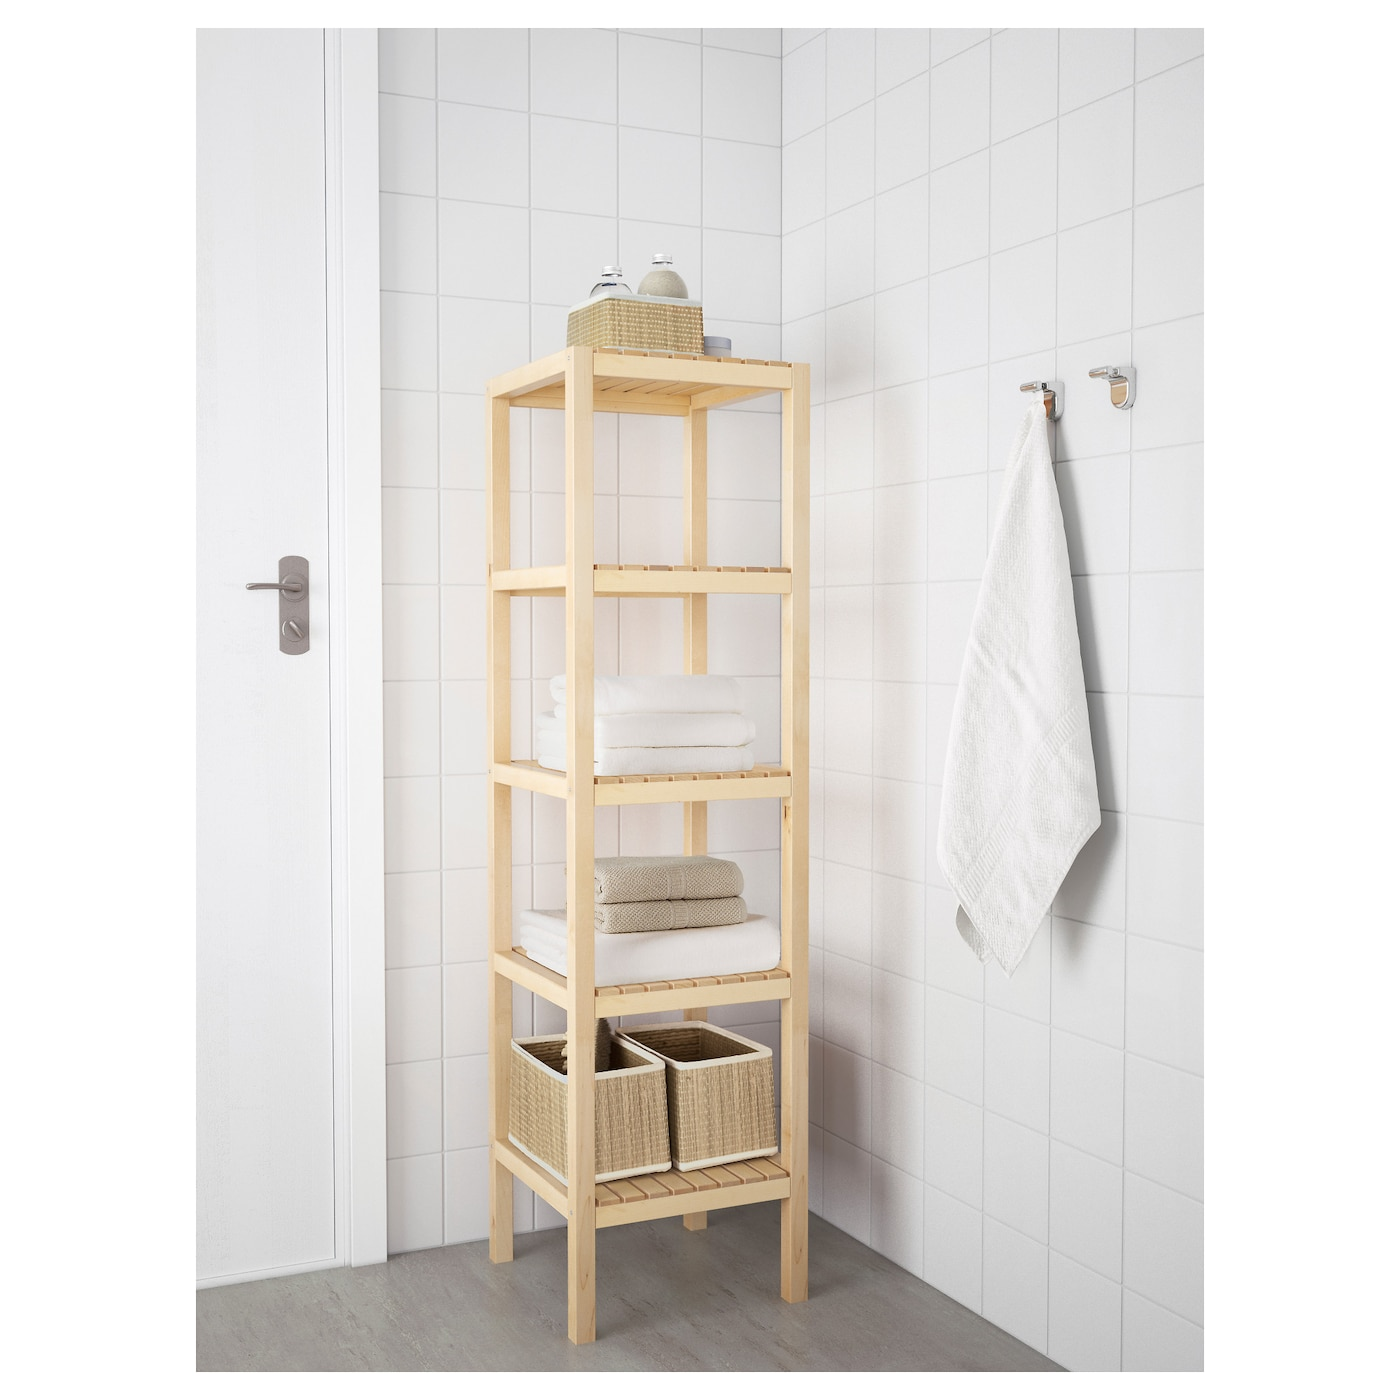 molger shelving unit birch x cm  ikea - ikea molger shelving unit the open shelves give an easy overview and easyreach